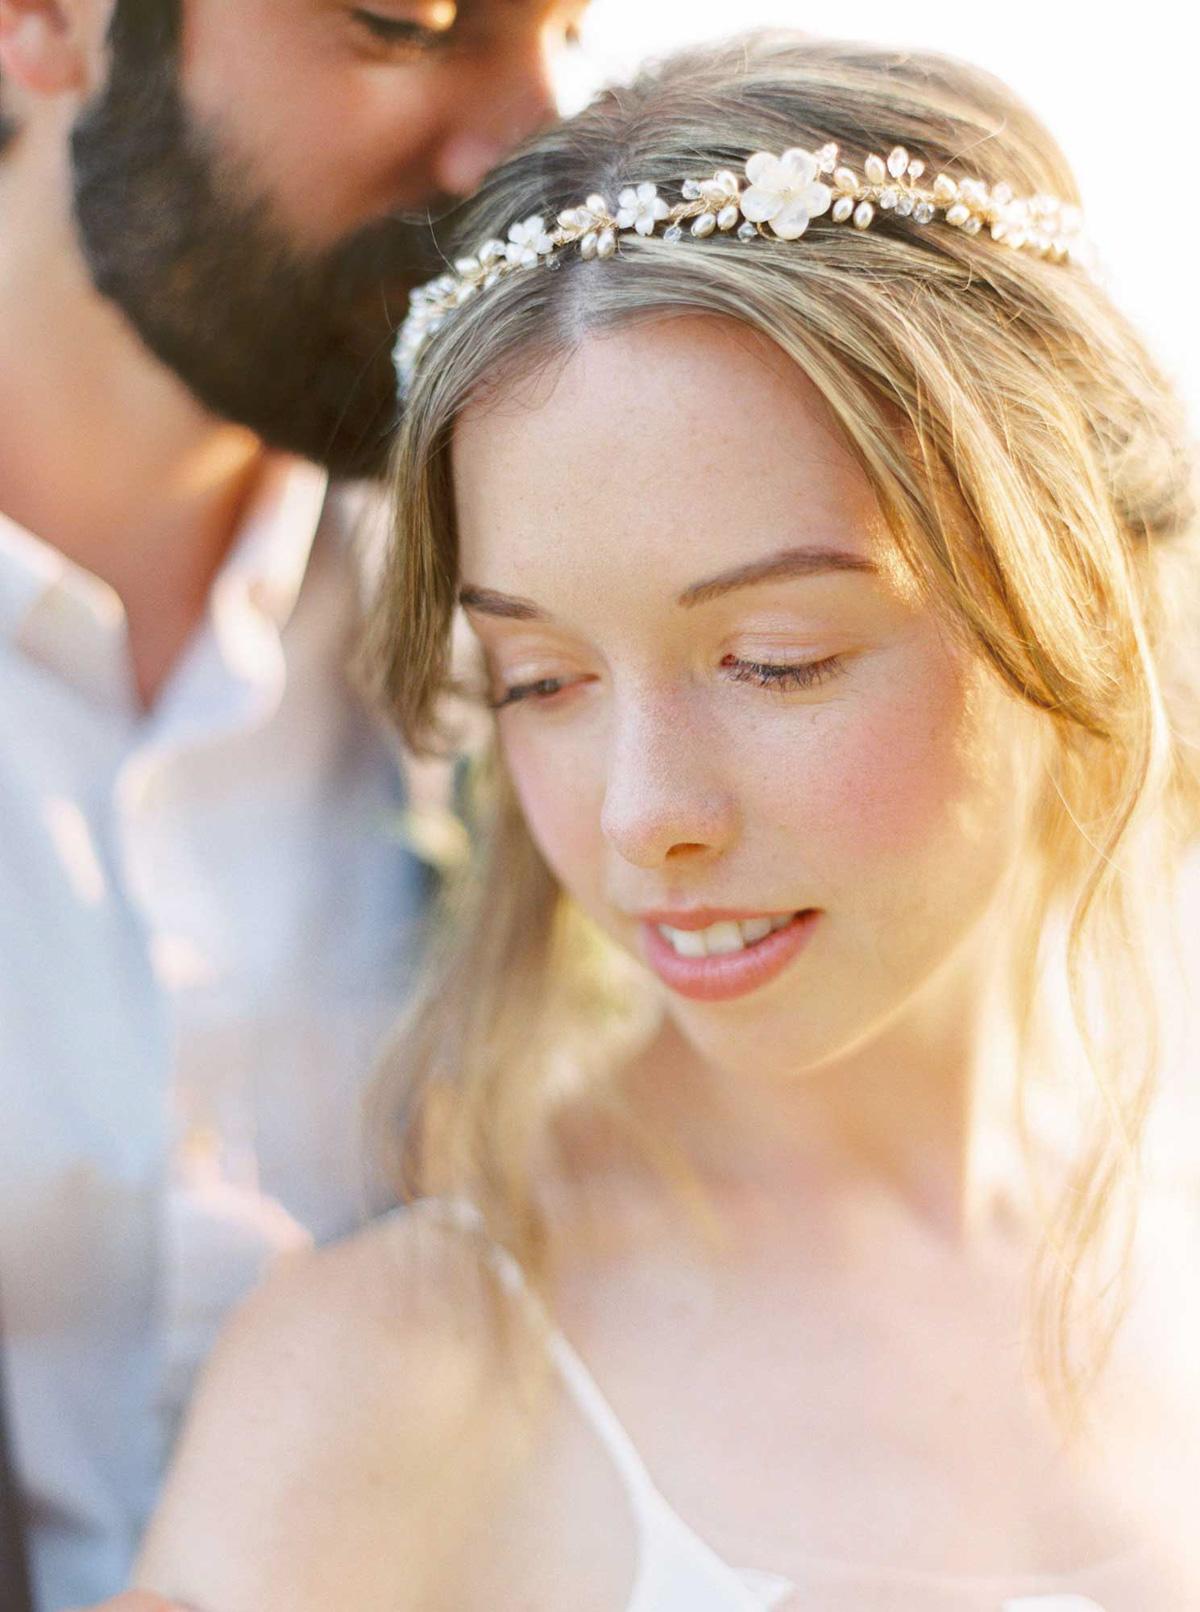 kayla-yestal-vineyard-bride-swish-list-woodland-weddings-niagara-wedding-editorial-49.jpg